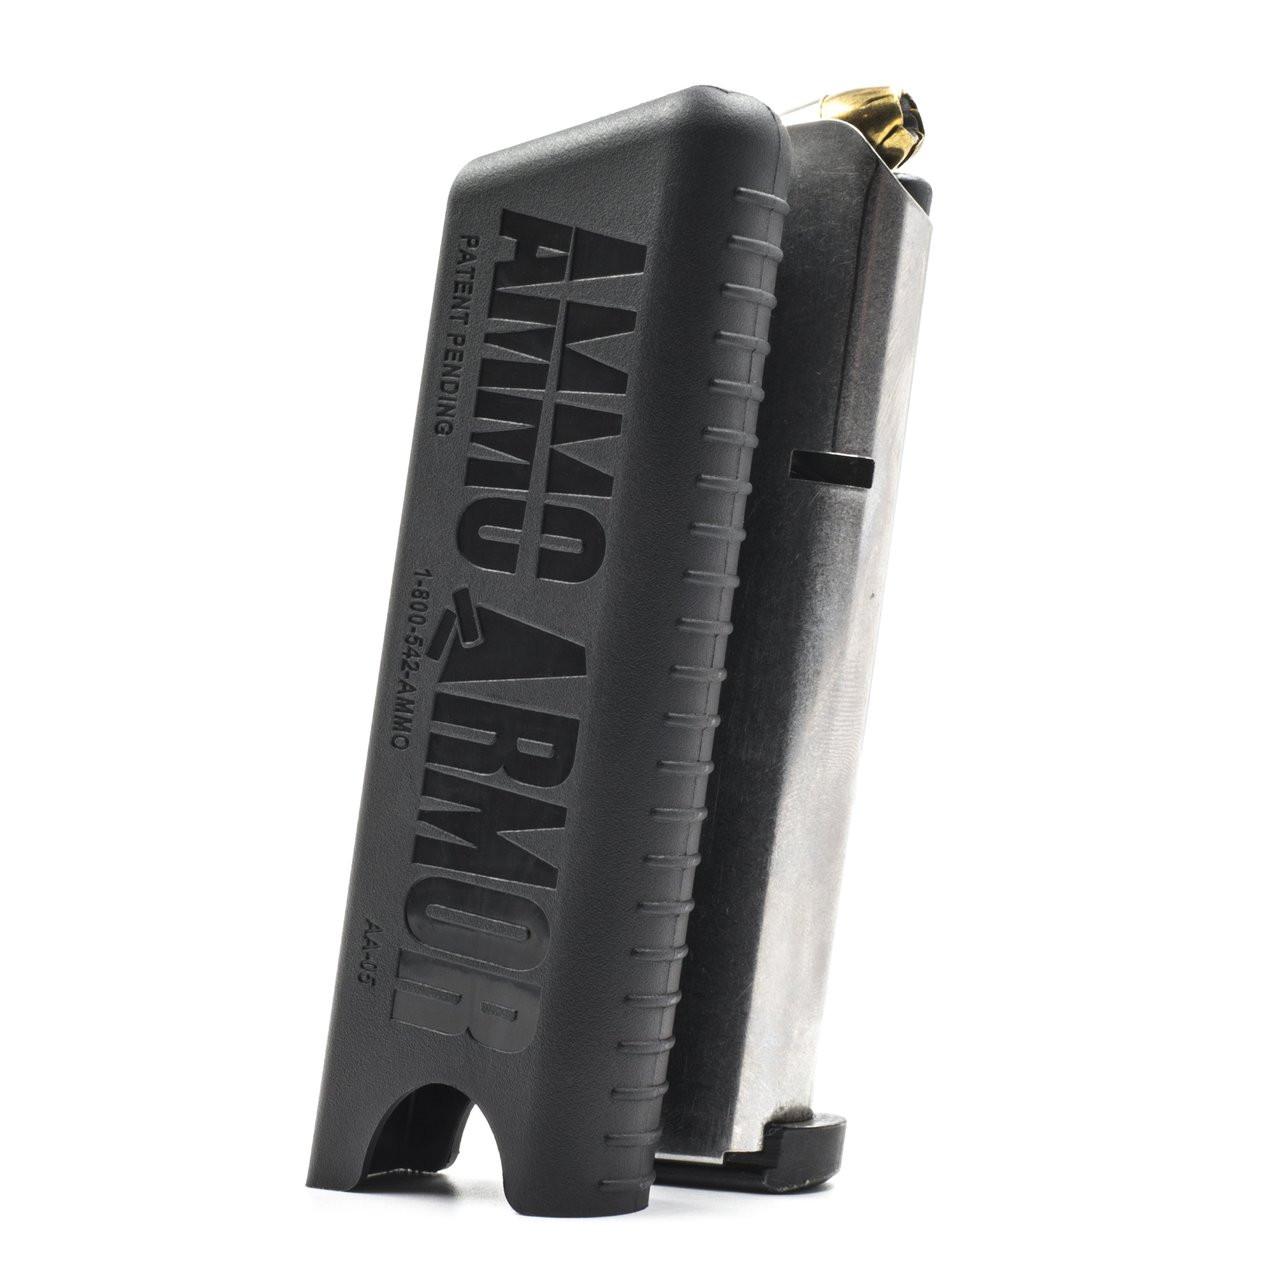 Kimber Super Carry Ultra (.45) Ammo Armor